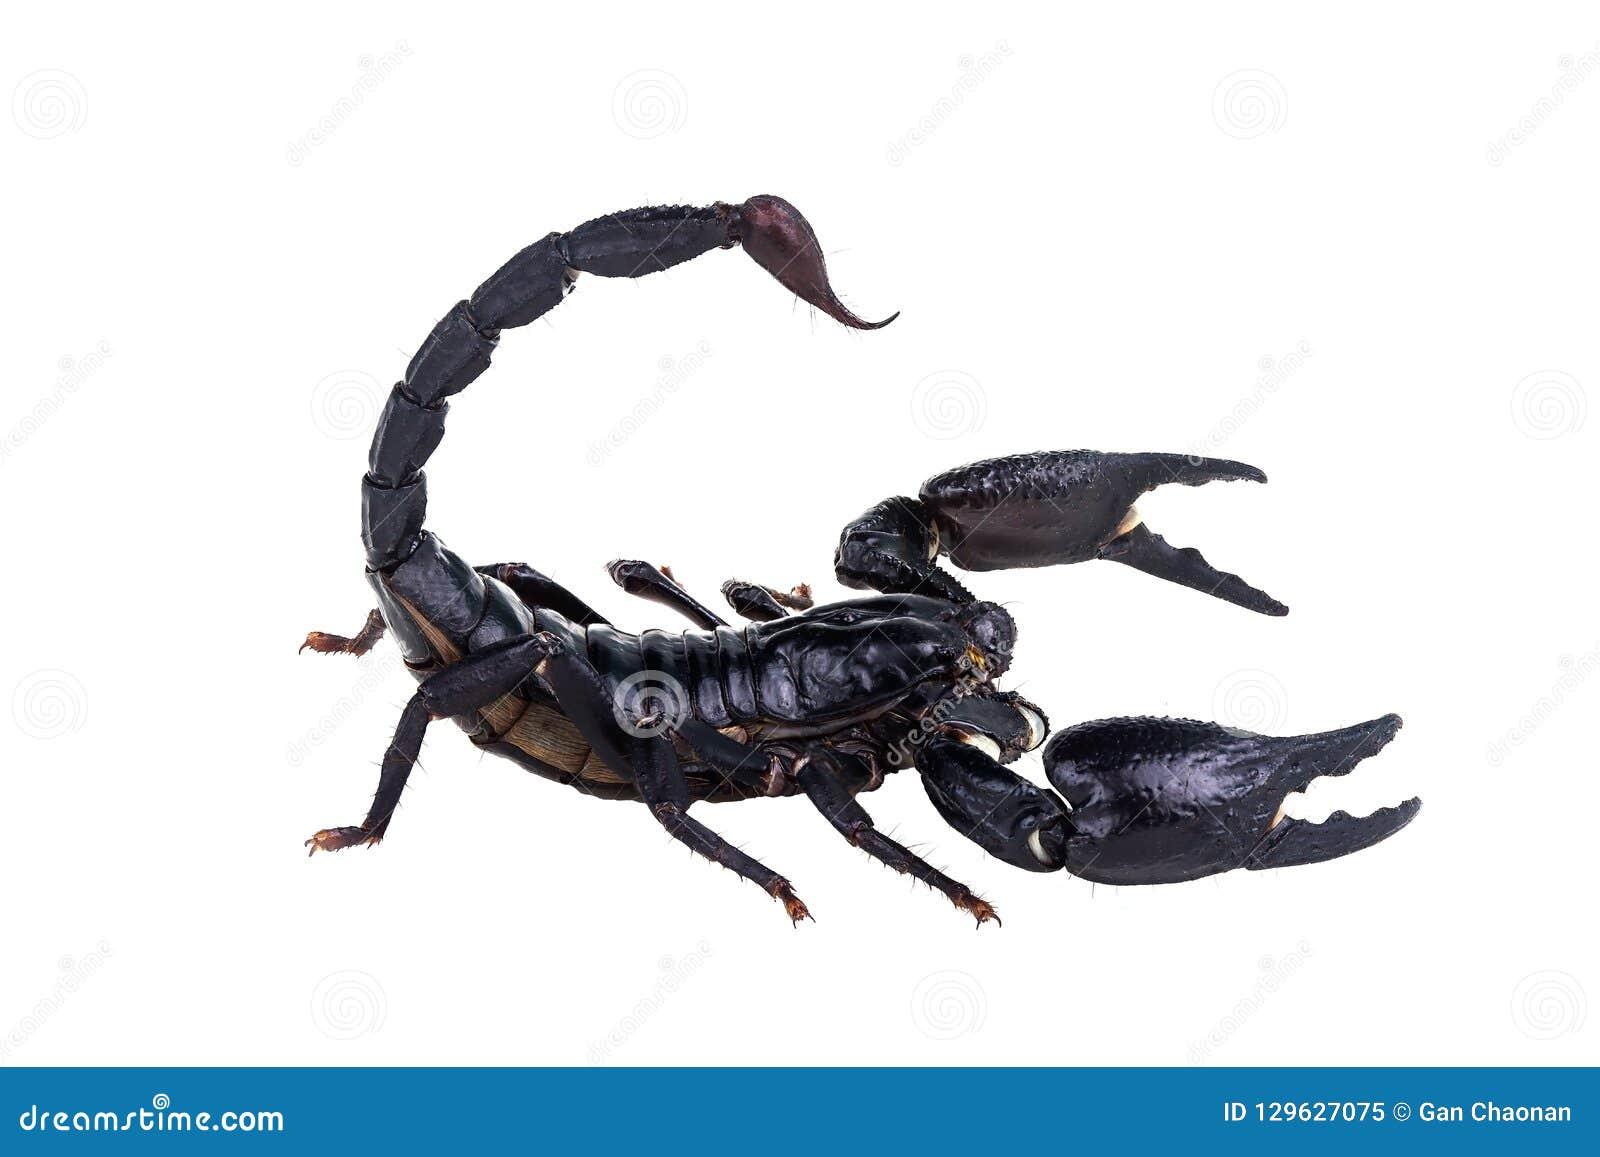 Emperor Scorpion, Pandinus imperator, of white background.